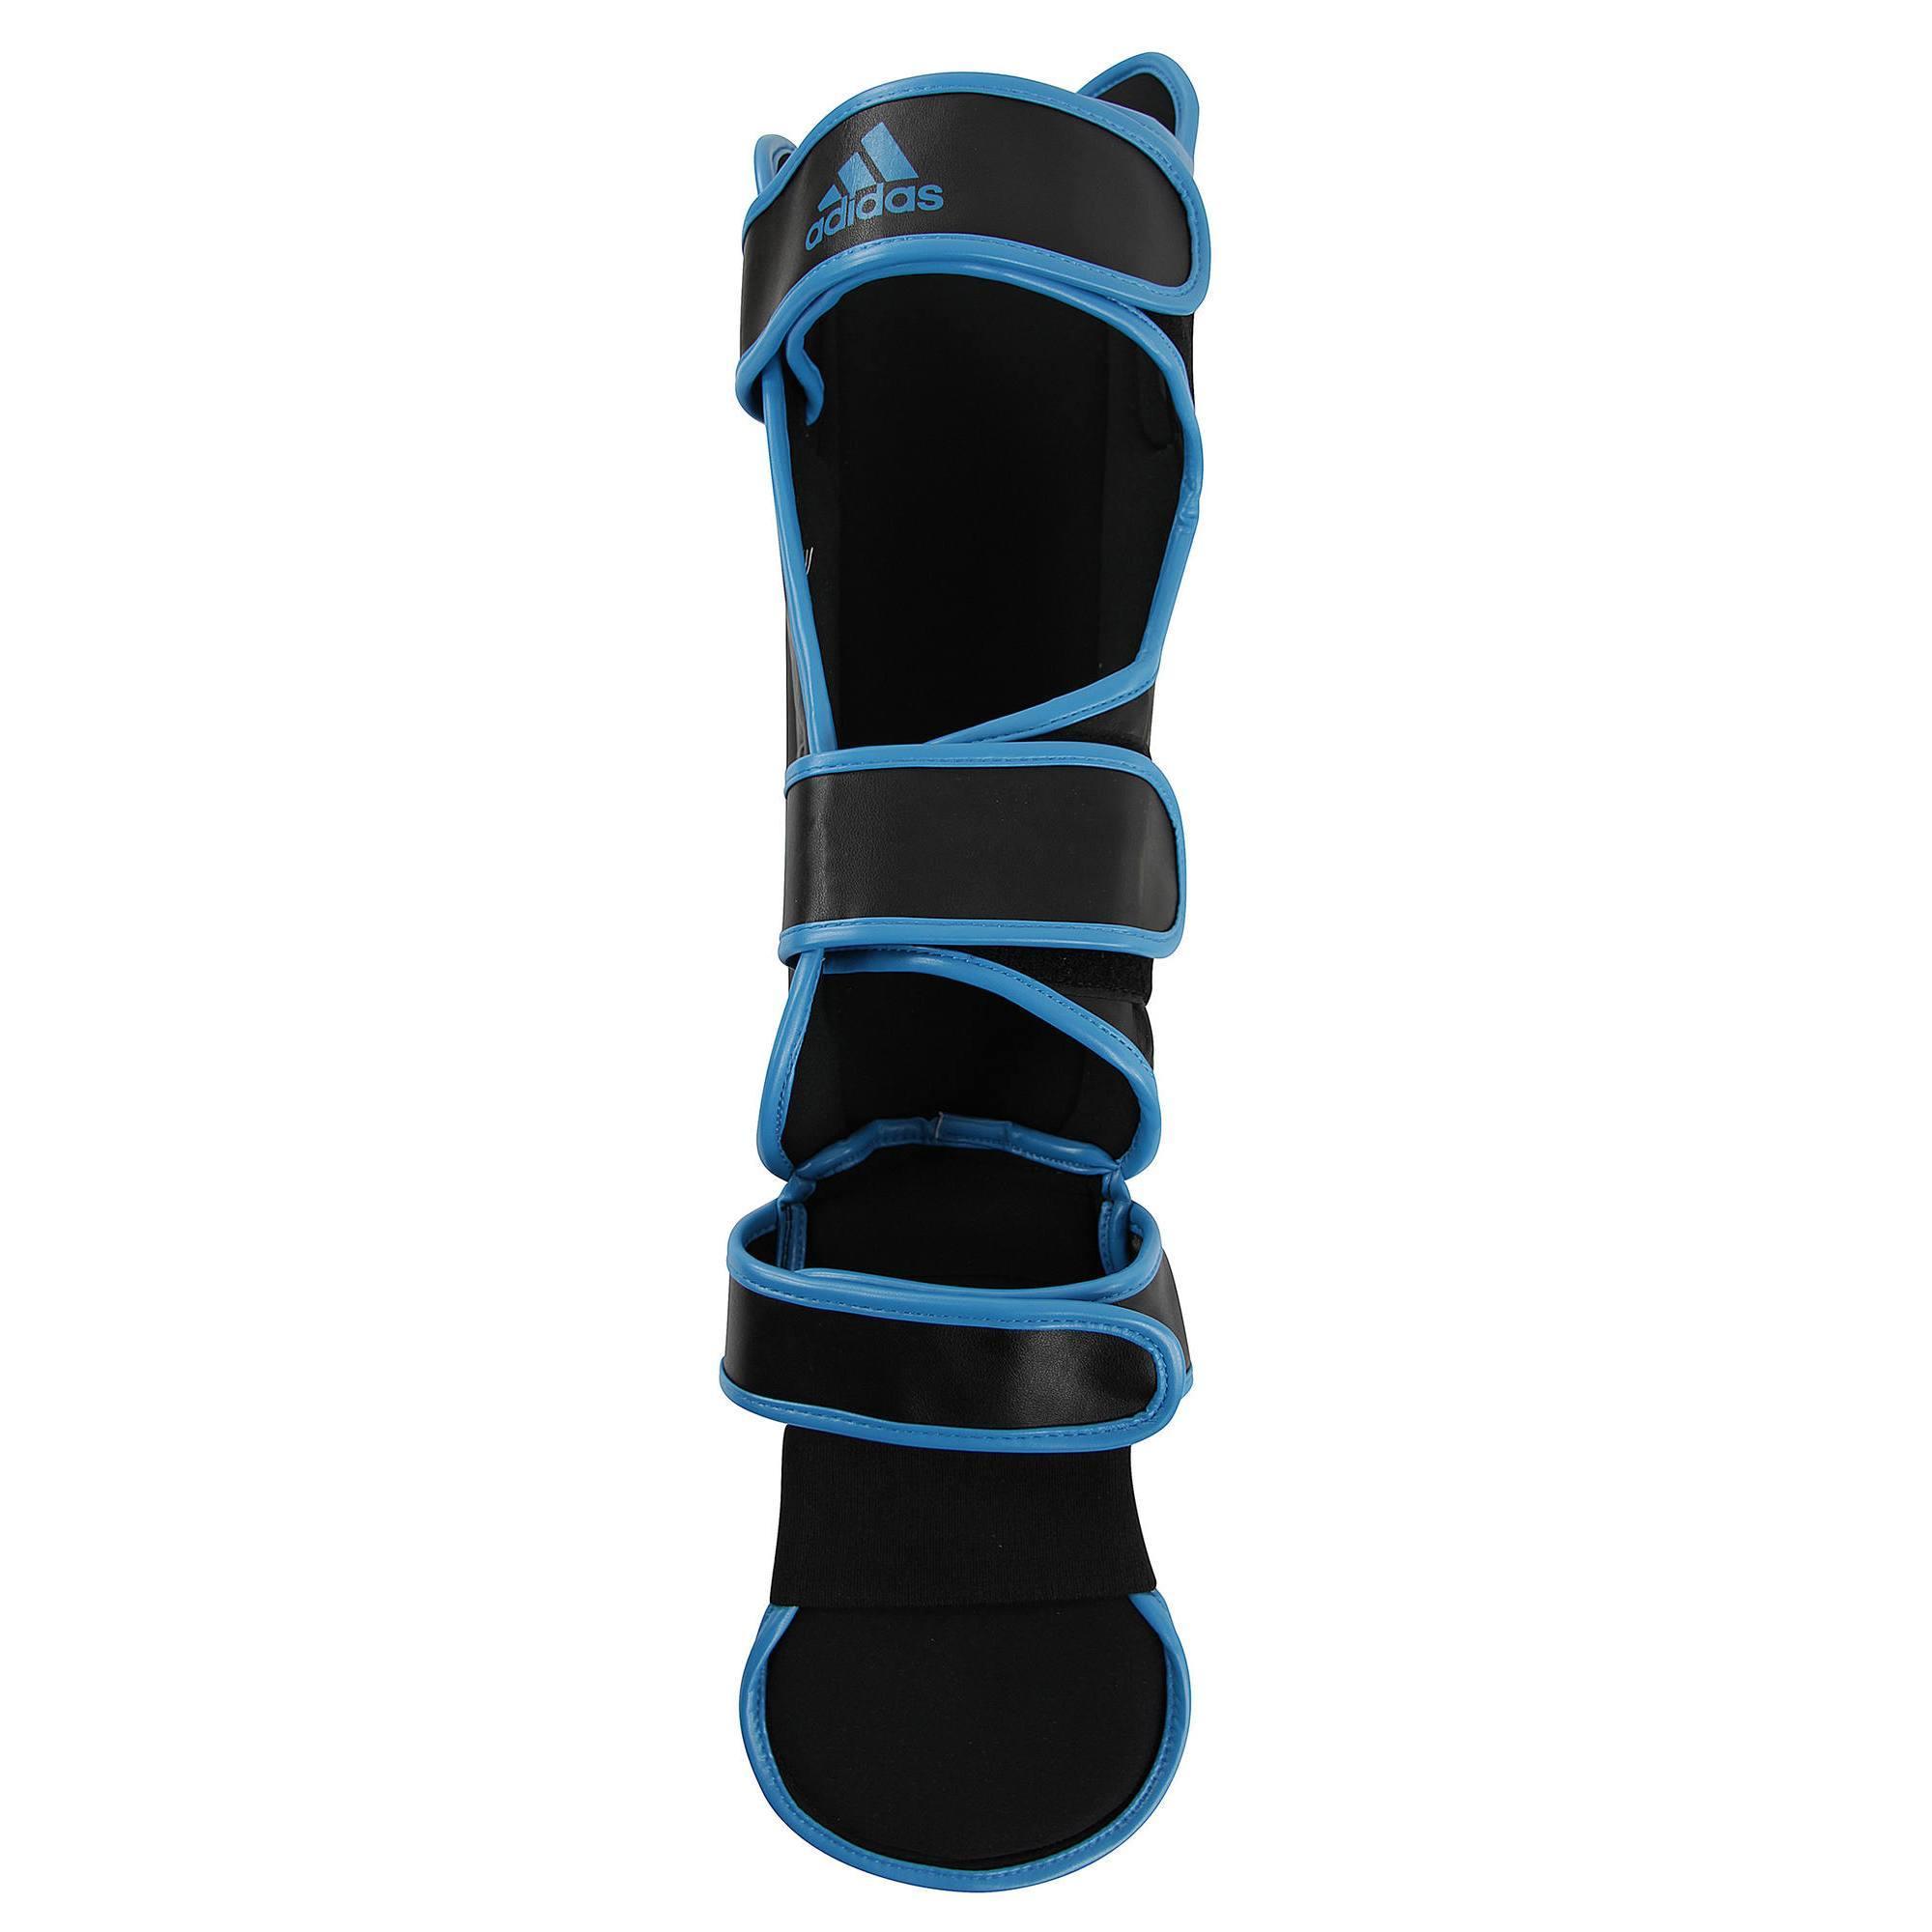 Prot ge tibia pied noir bleu - Protege tibia decathlon ...